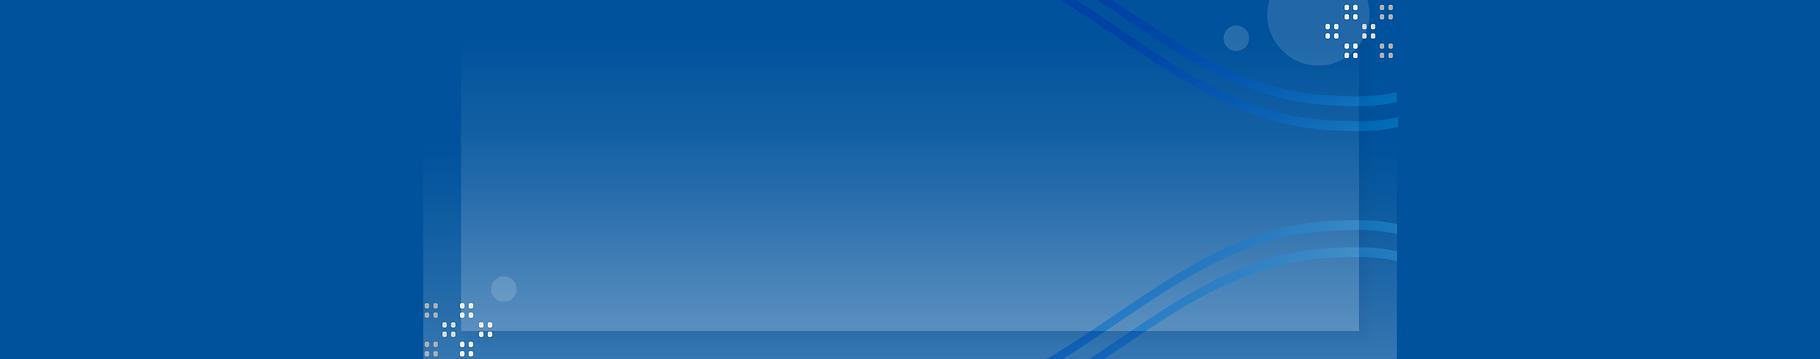 RSNA banner-06.png